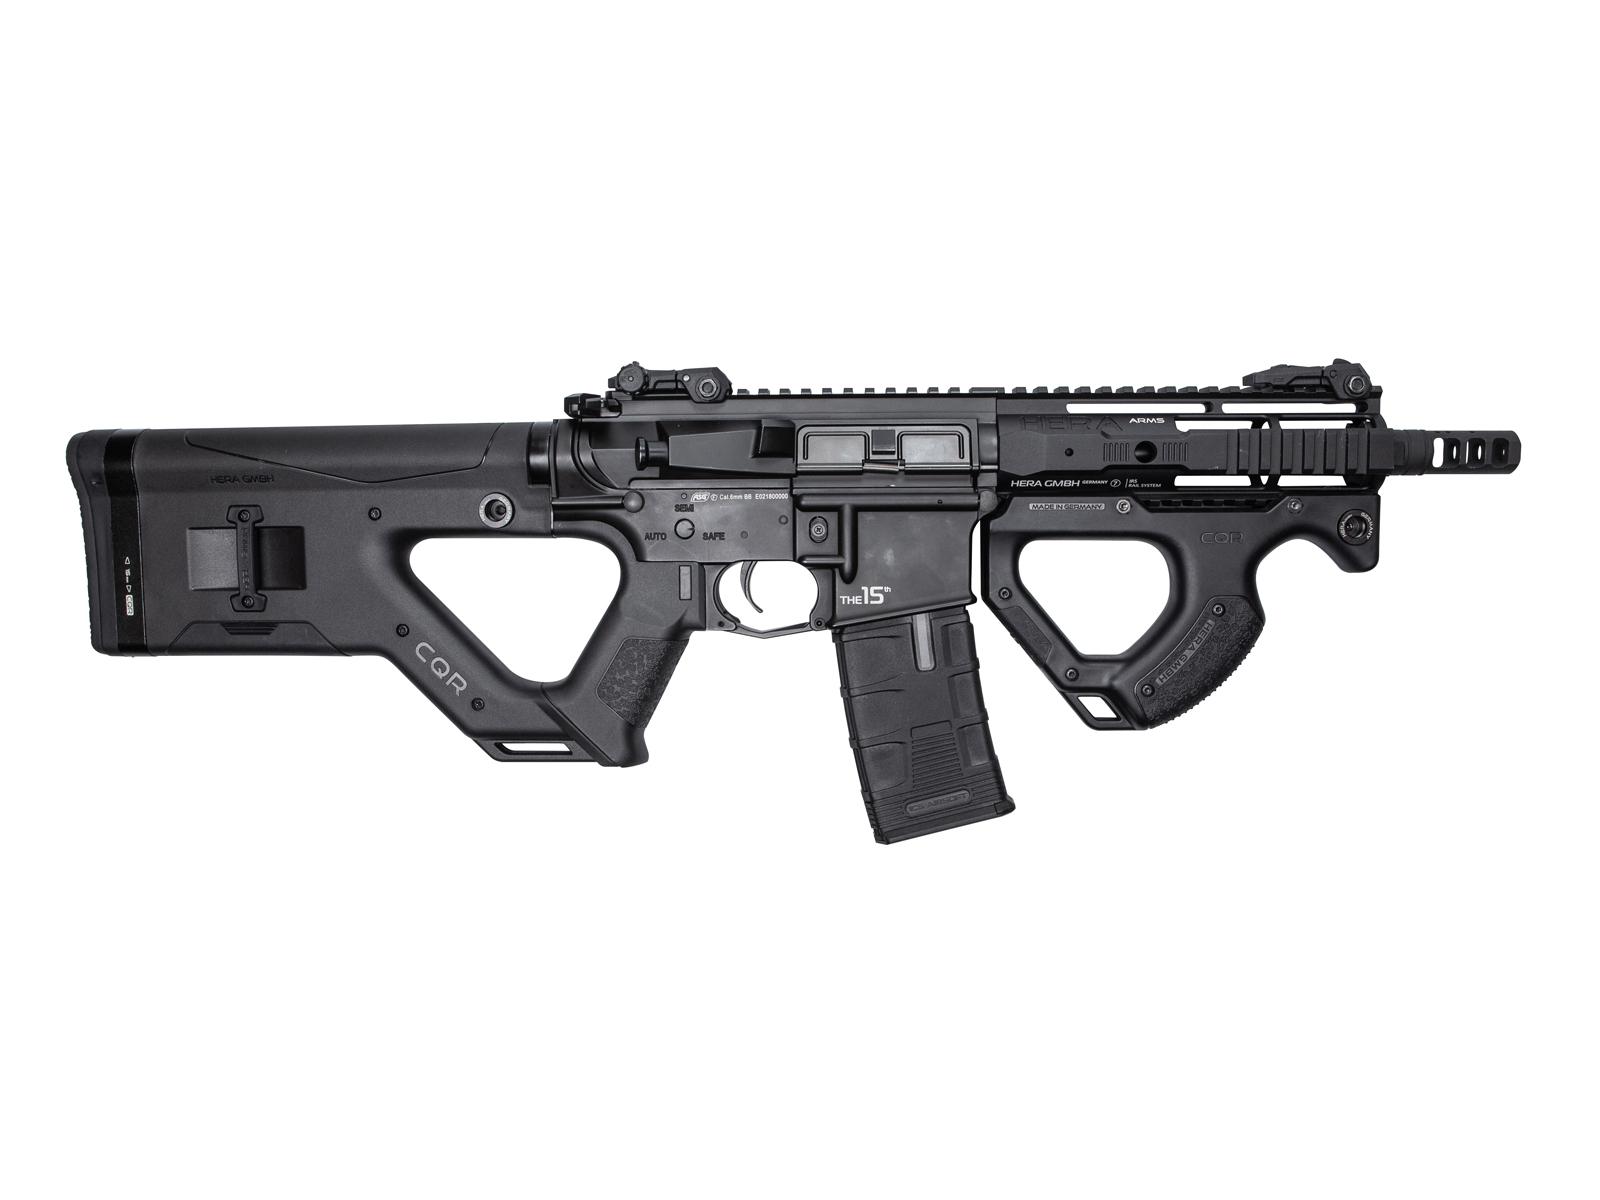 HERA ARMS CQR product image